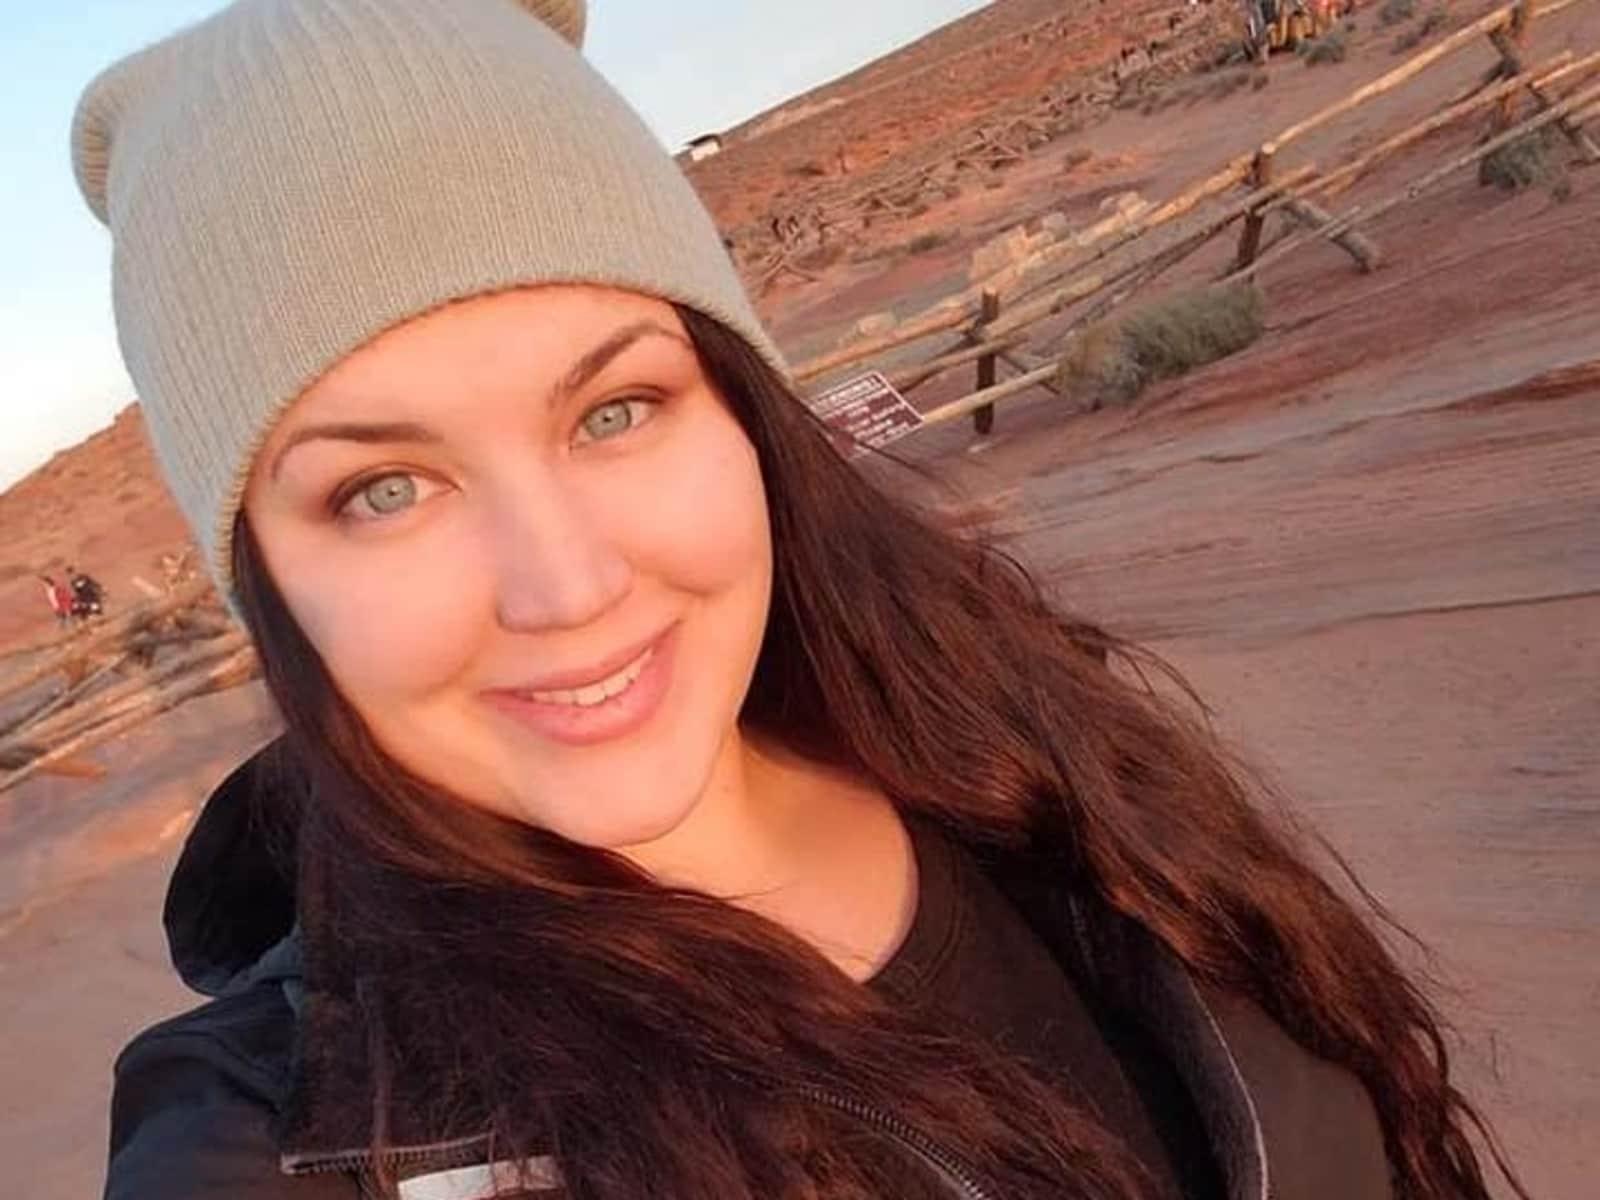 Rachel from Portland, Oregon, United States